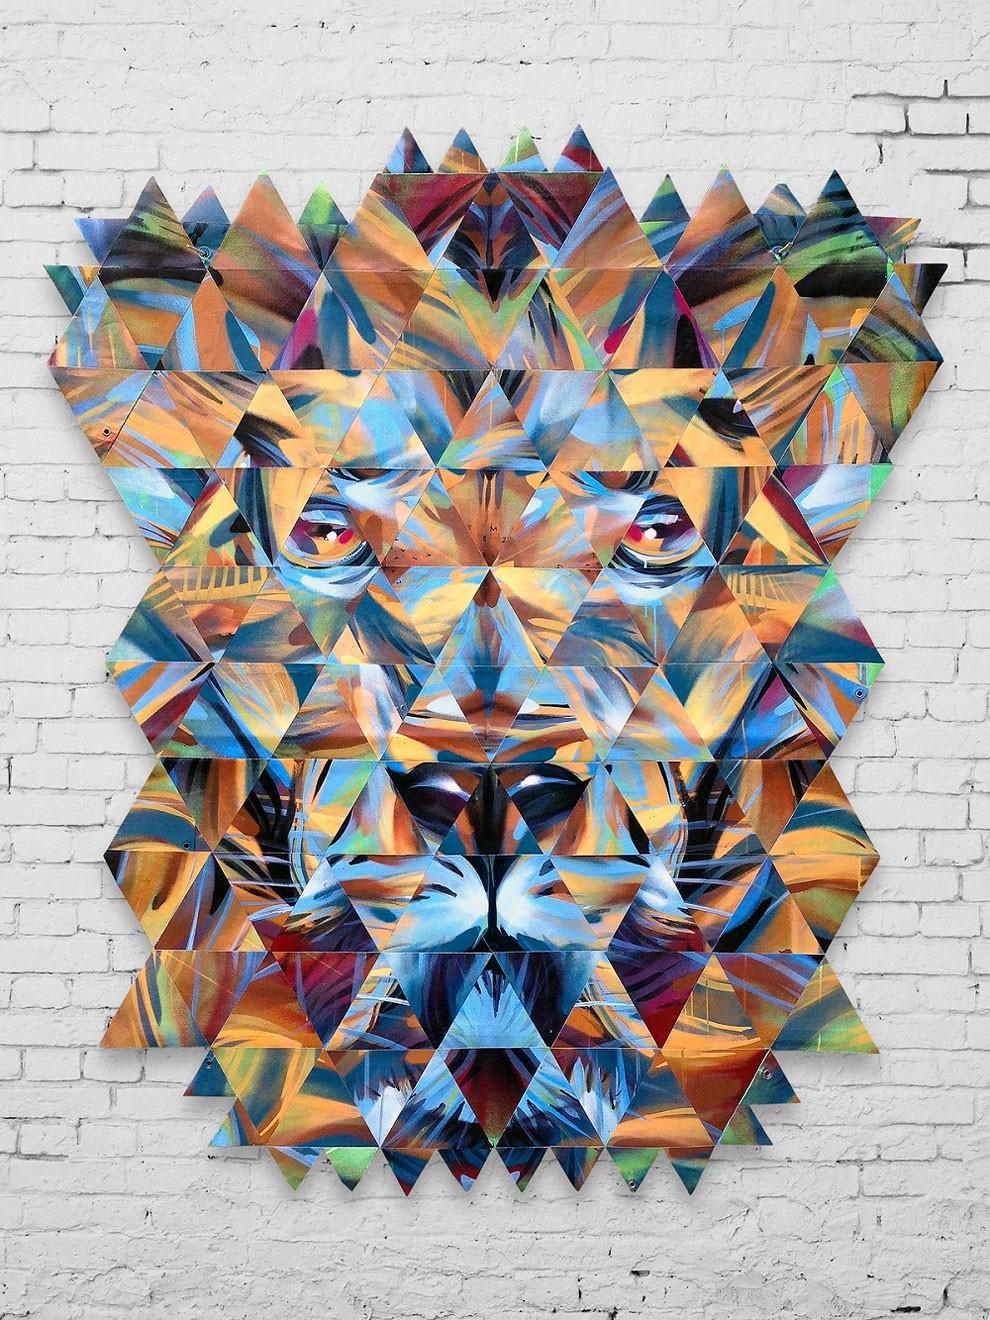 street-art-2015-07